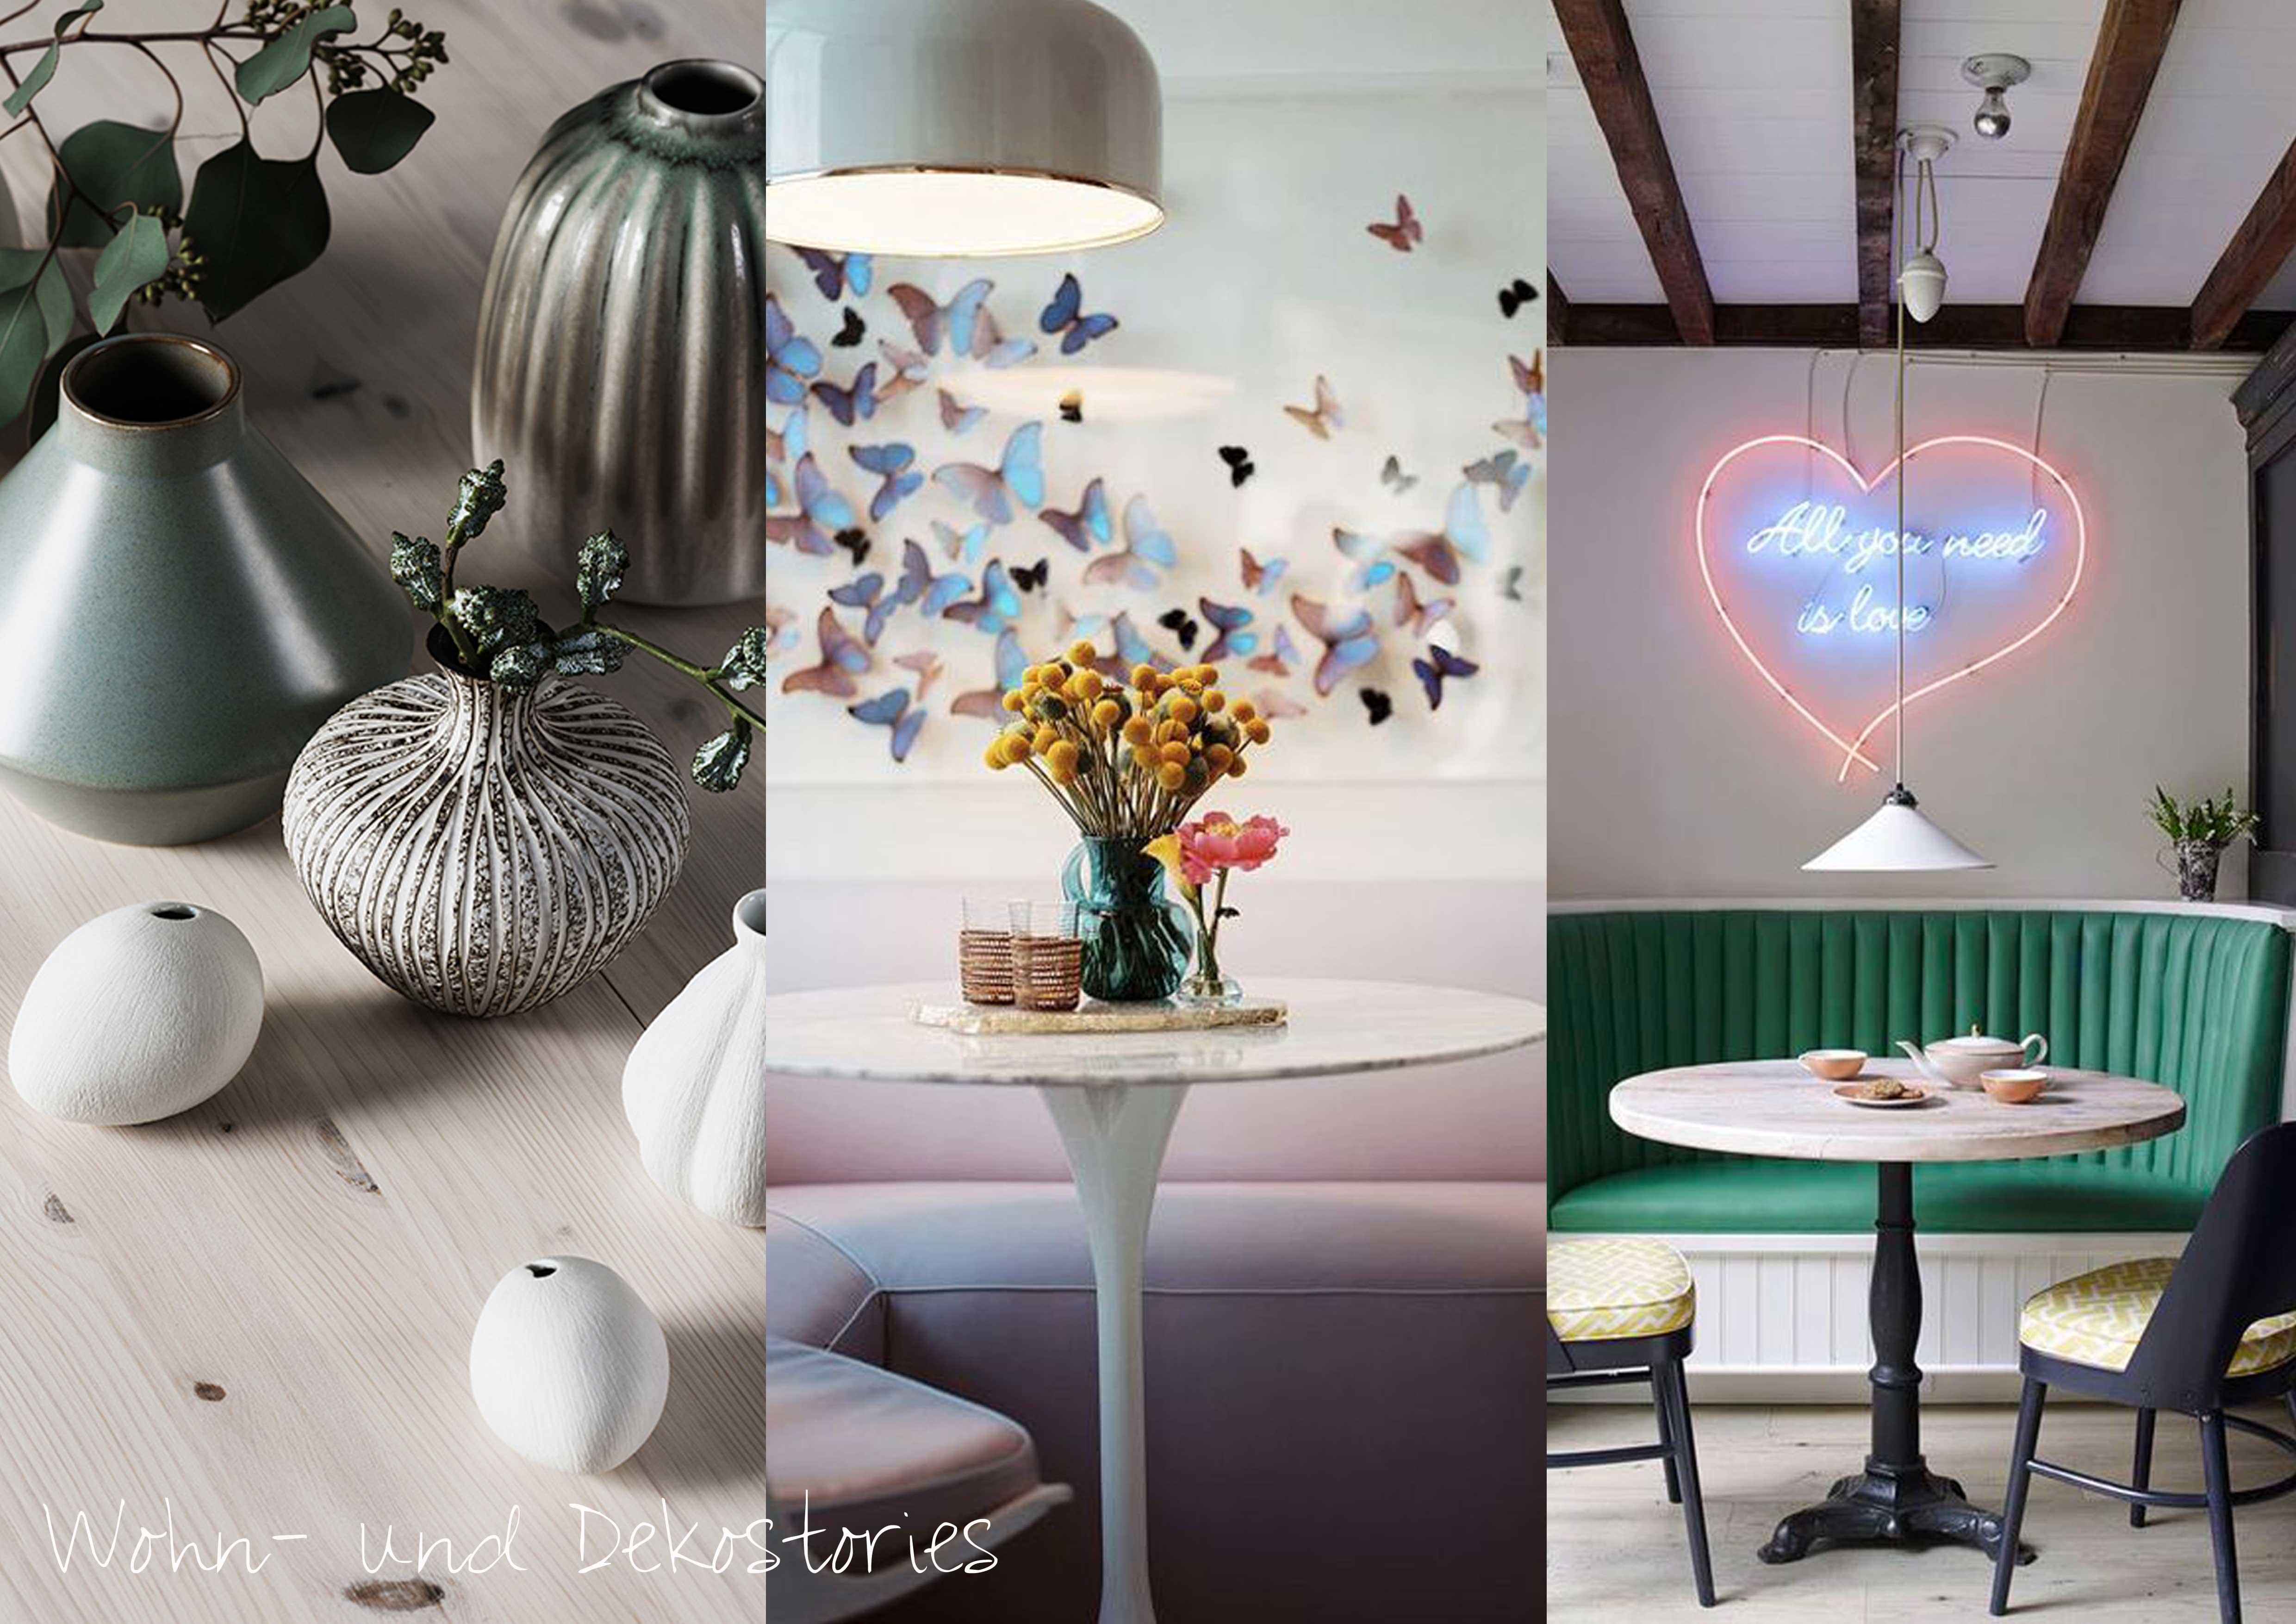 journelles seite 58 von 353 your daily dose of fashion. Black Bedroom Furniture Sets. Home Design Ideas